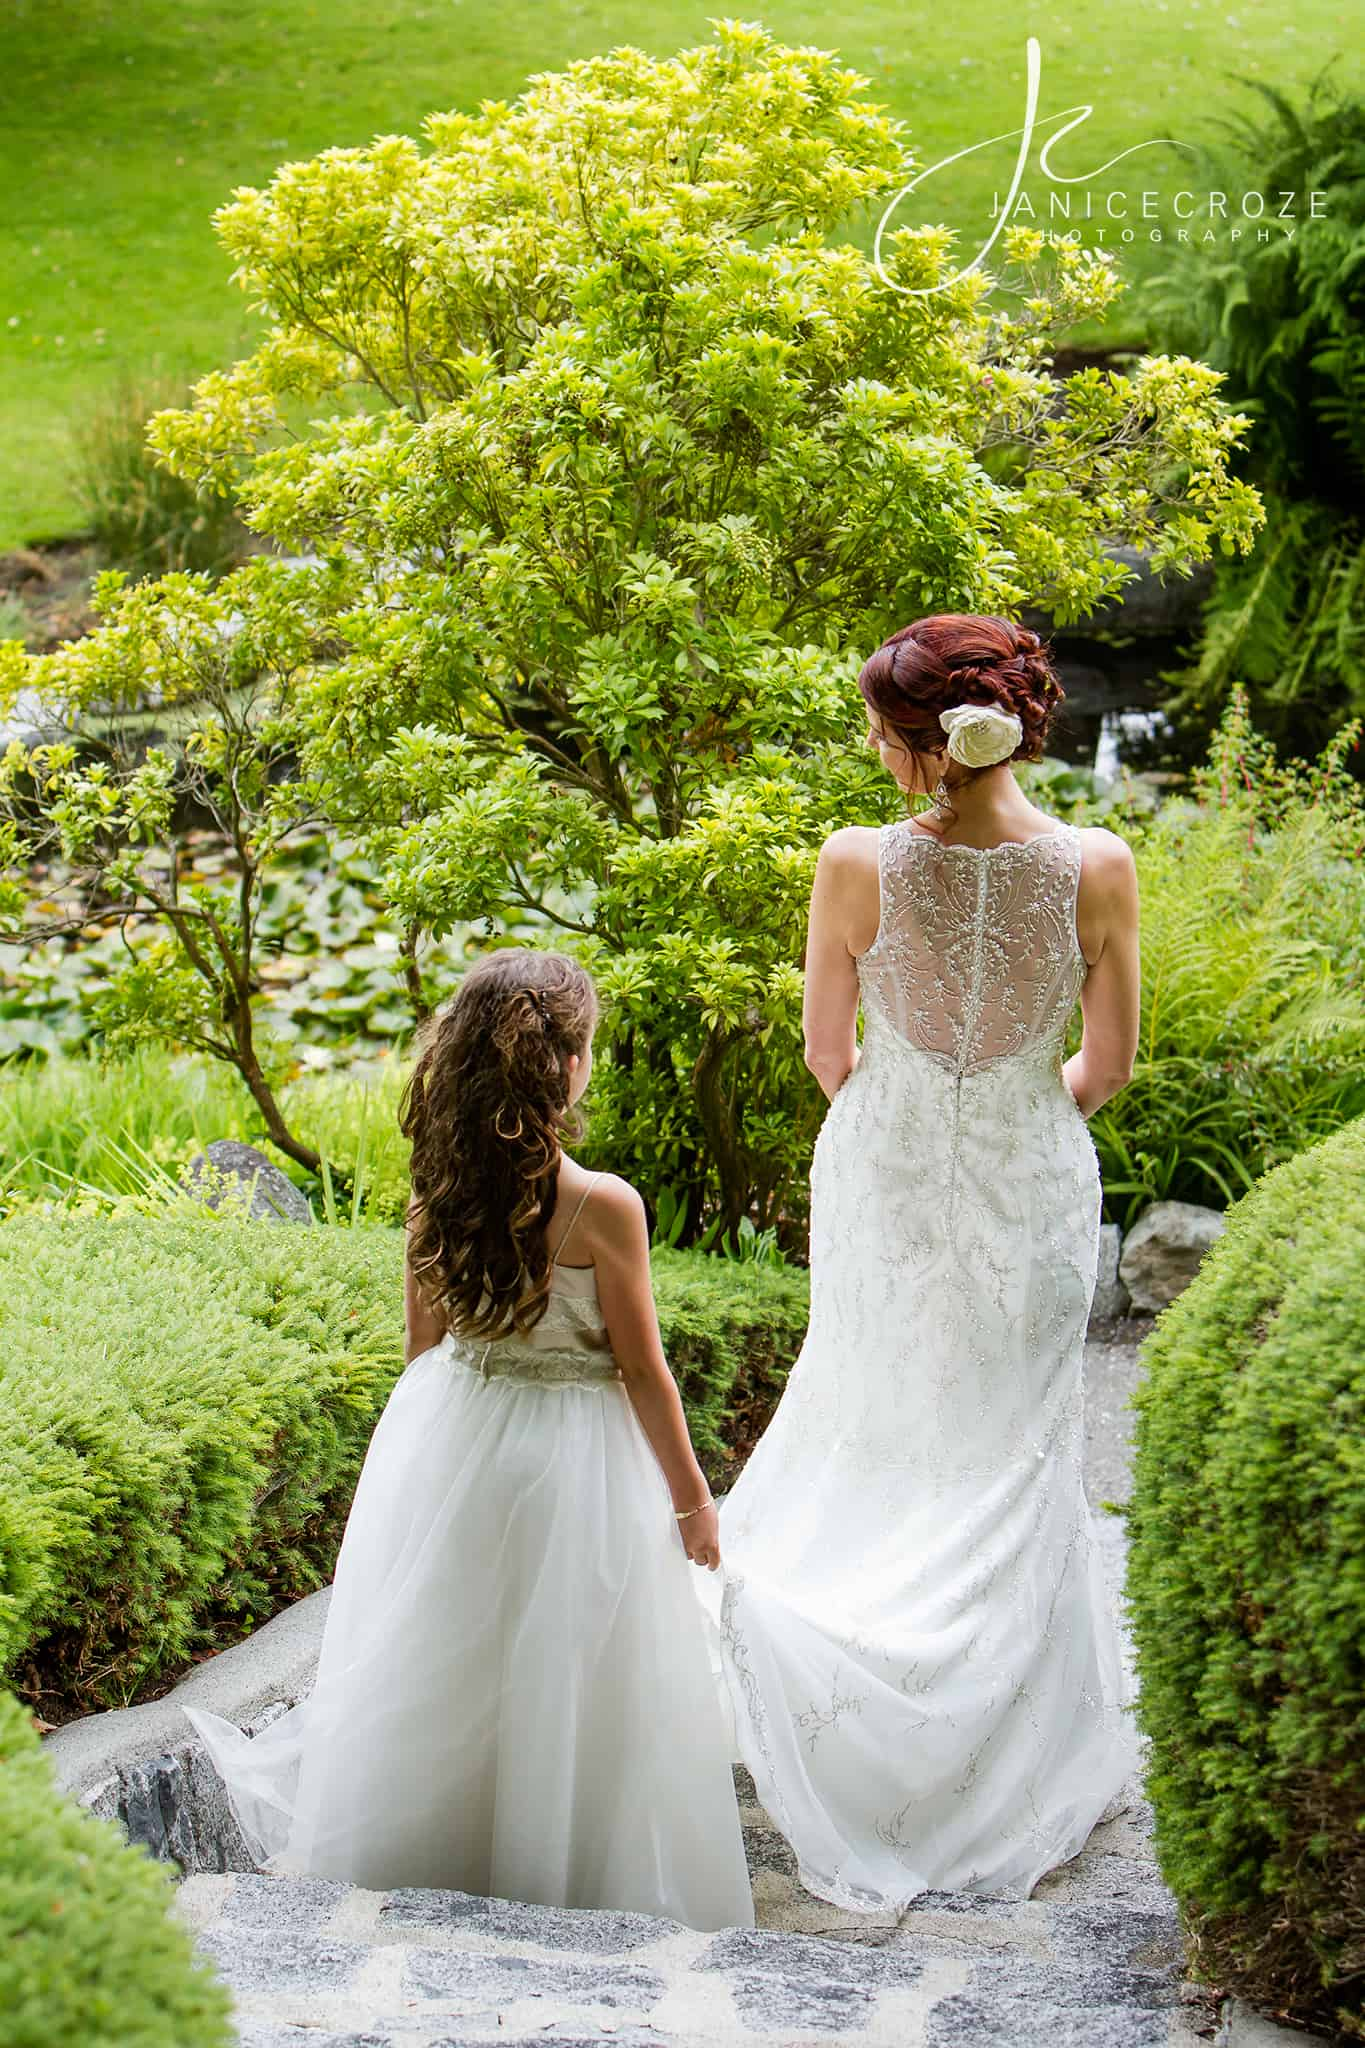 Preppy Flower Girl Dresses - Preppy Wedding Style